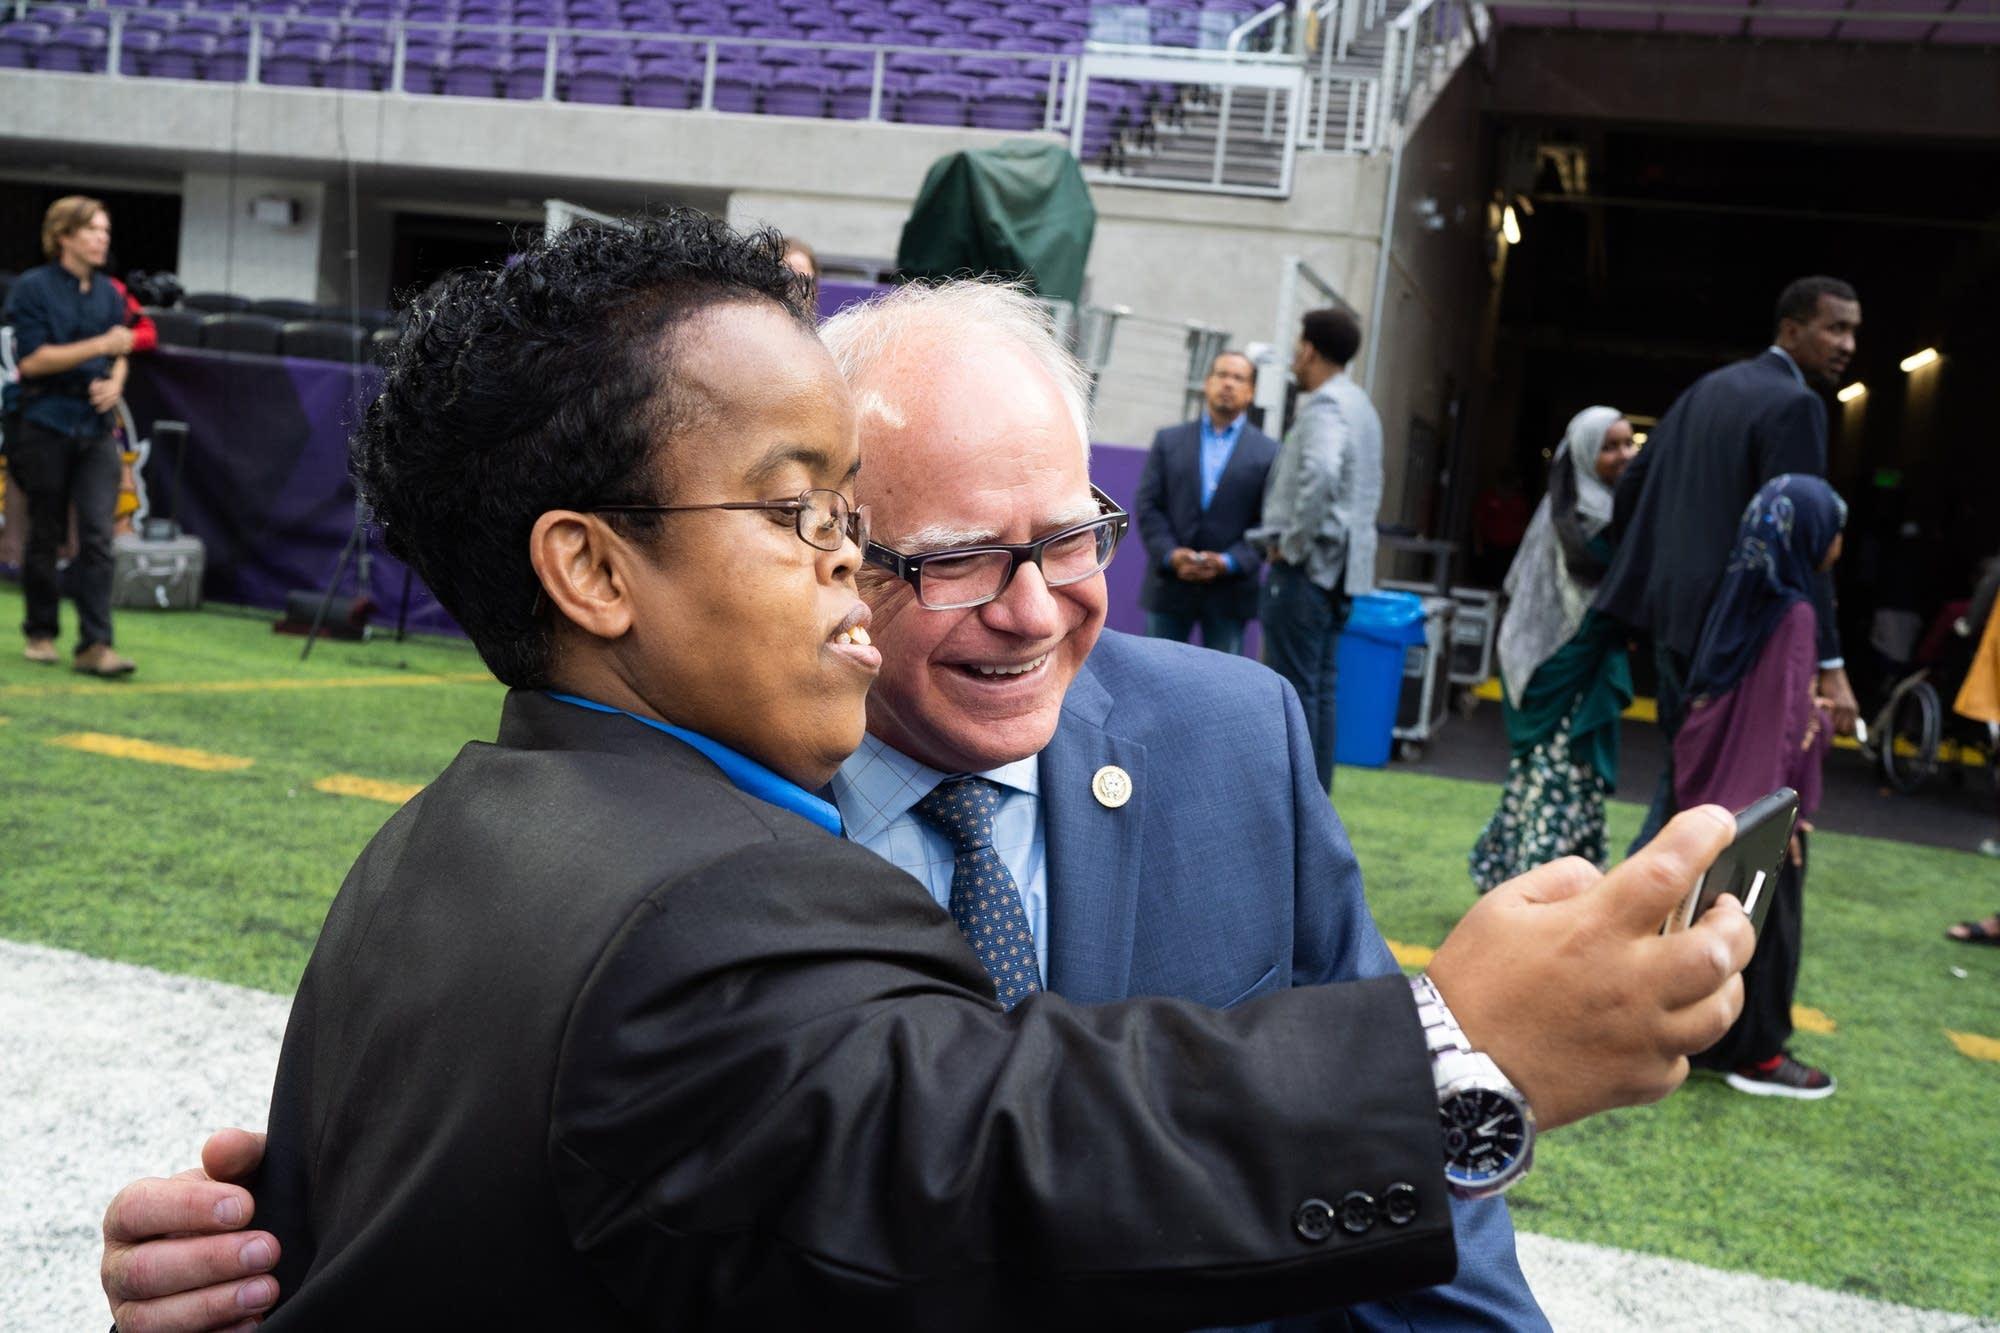 DFL gubernatorial candidate Tim Walz takes a selfie with Abdi Abdulla.